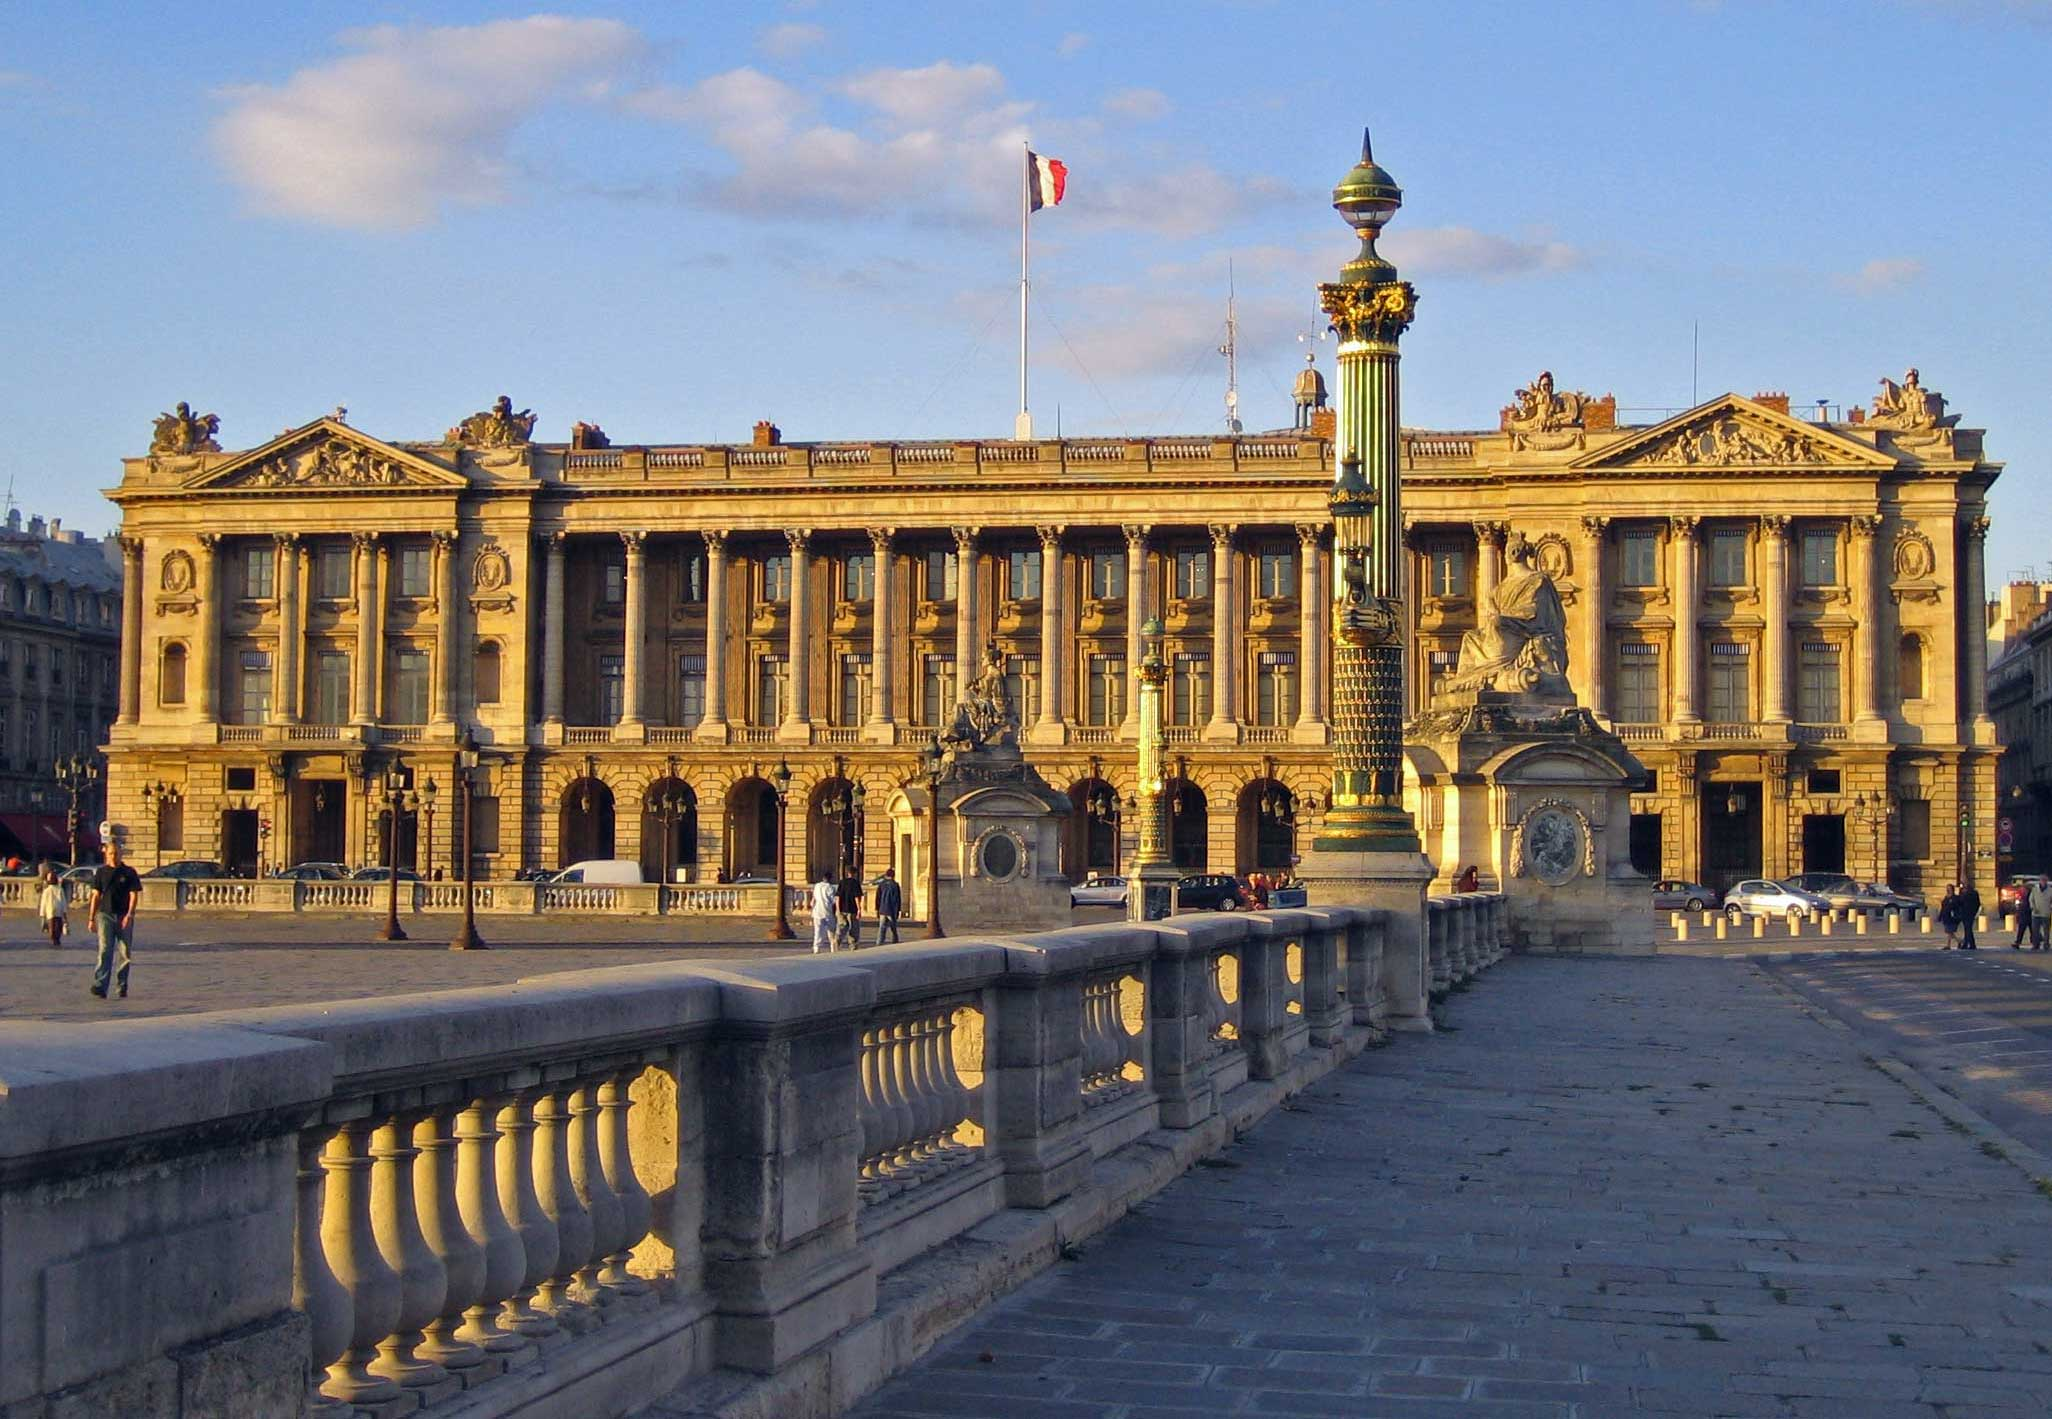 https://ajl-asso.fr/marechal-leclerc/wp-content/uploads/sites/5/2021/05/HOTEL-MARINE.jpg